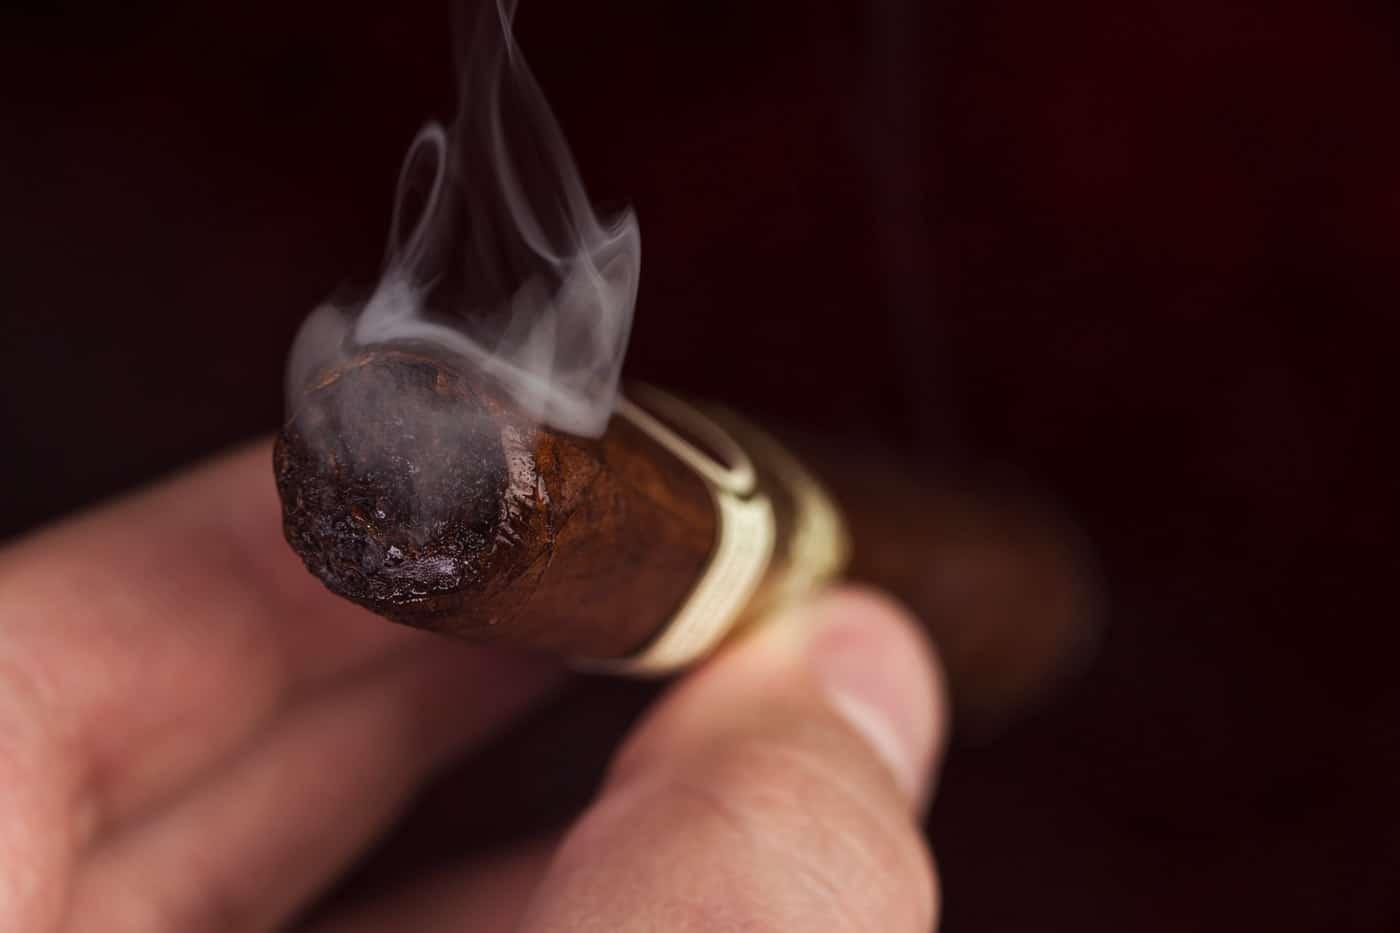 Padrón 1964 Anniversary Series Presidente Maduro cigar review